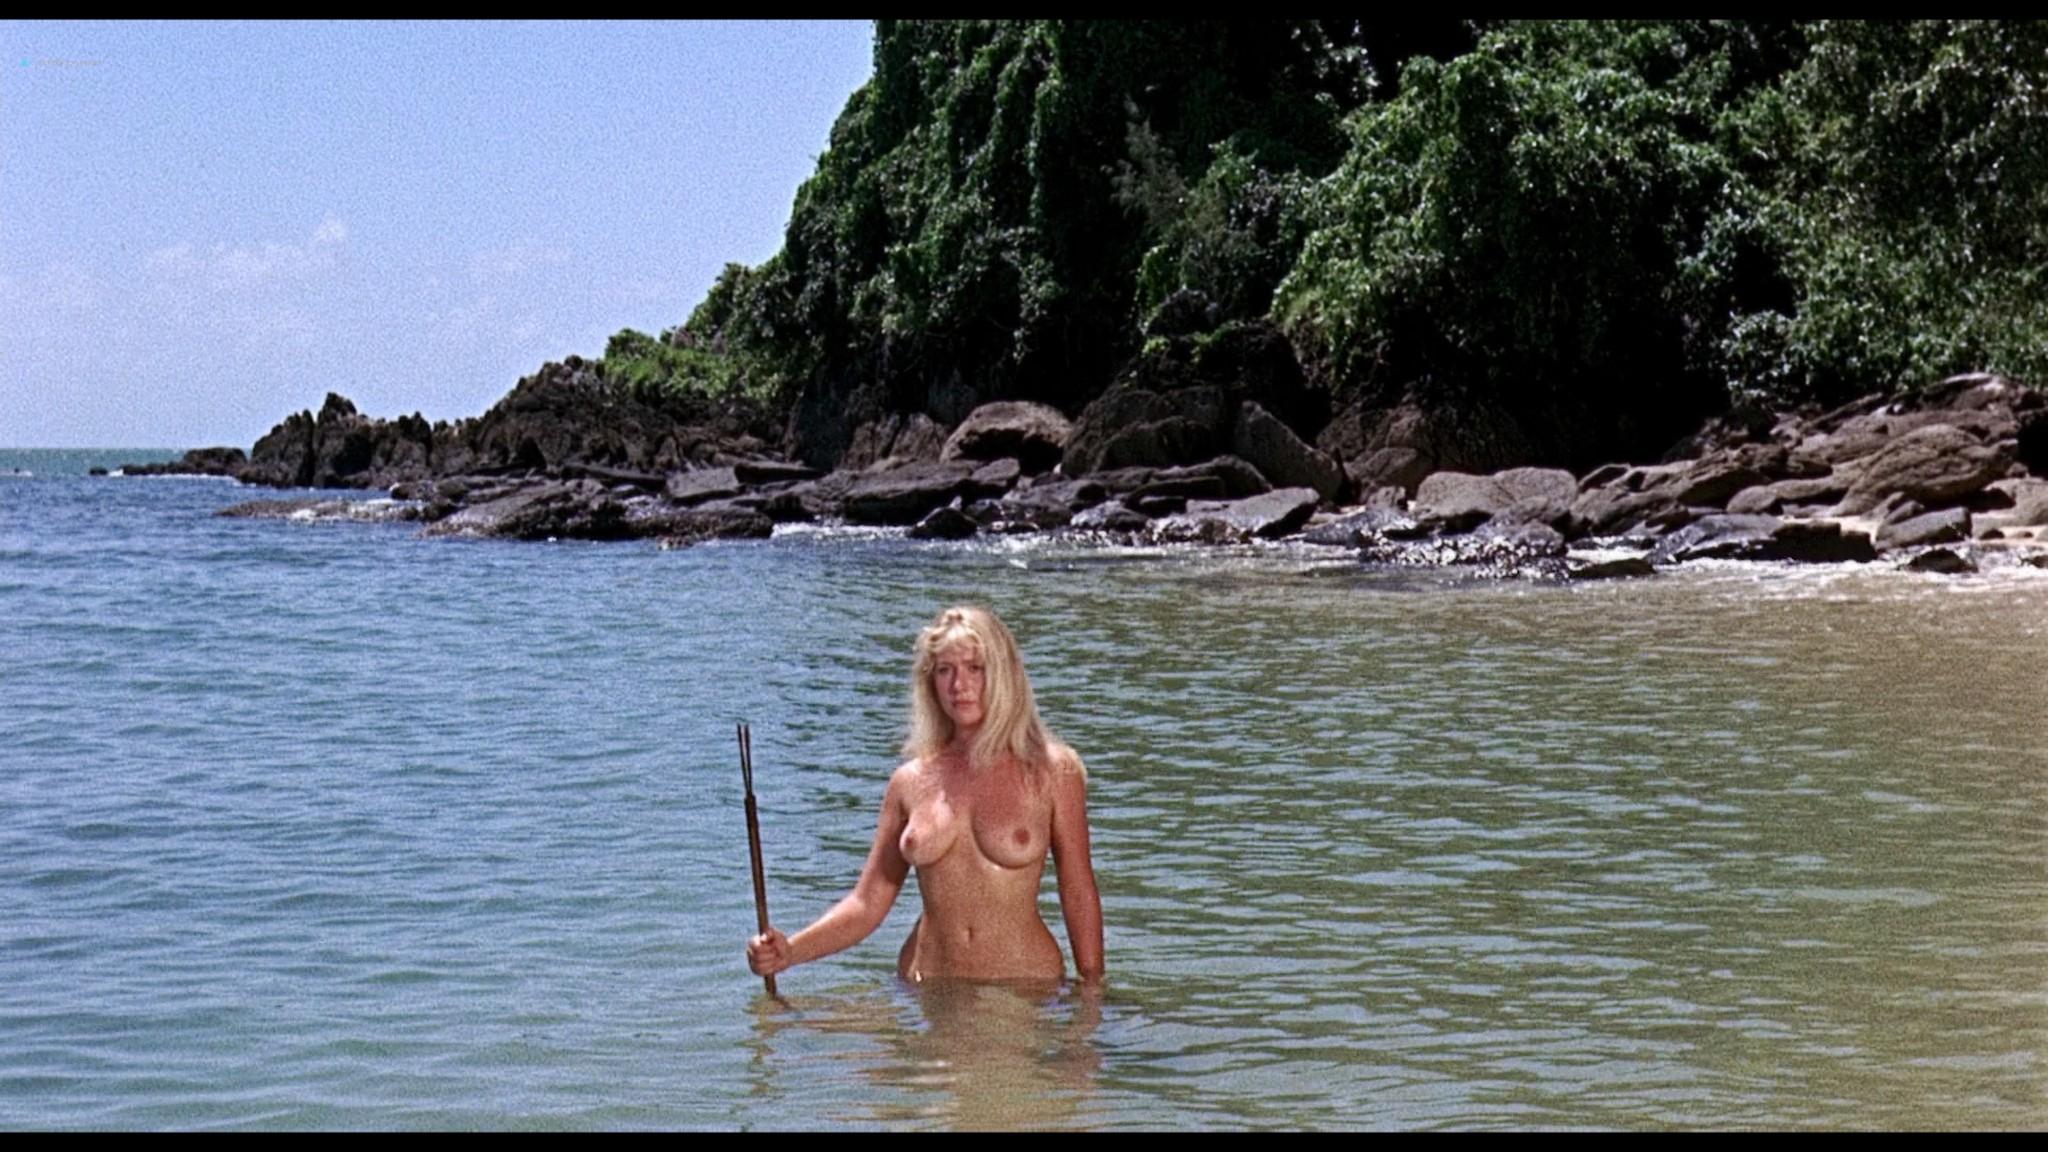 Helen Mirren nude skinny dipping Clarissa Kaye-Mason nude sex - Age of Consent (1969) HD 1080p BluRay Remux (6)